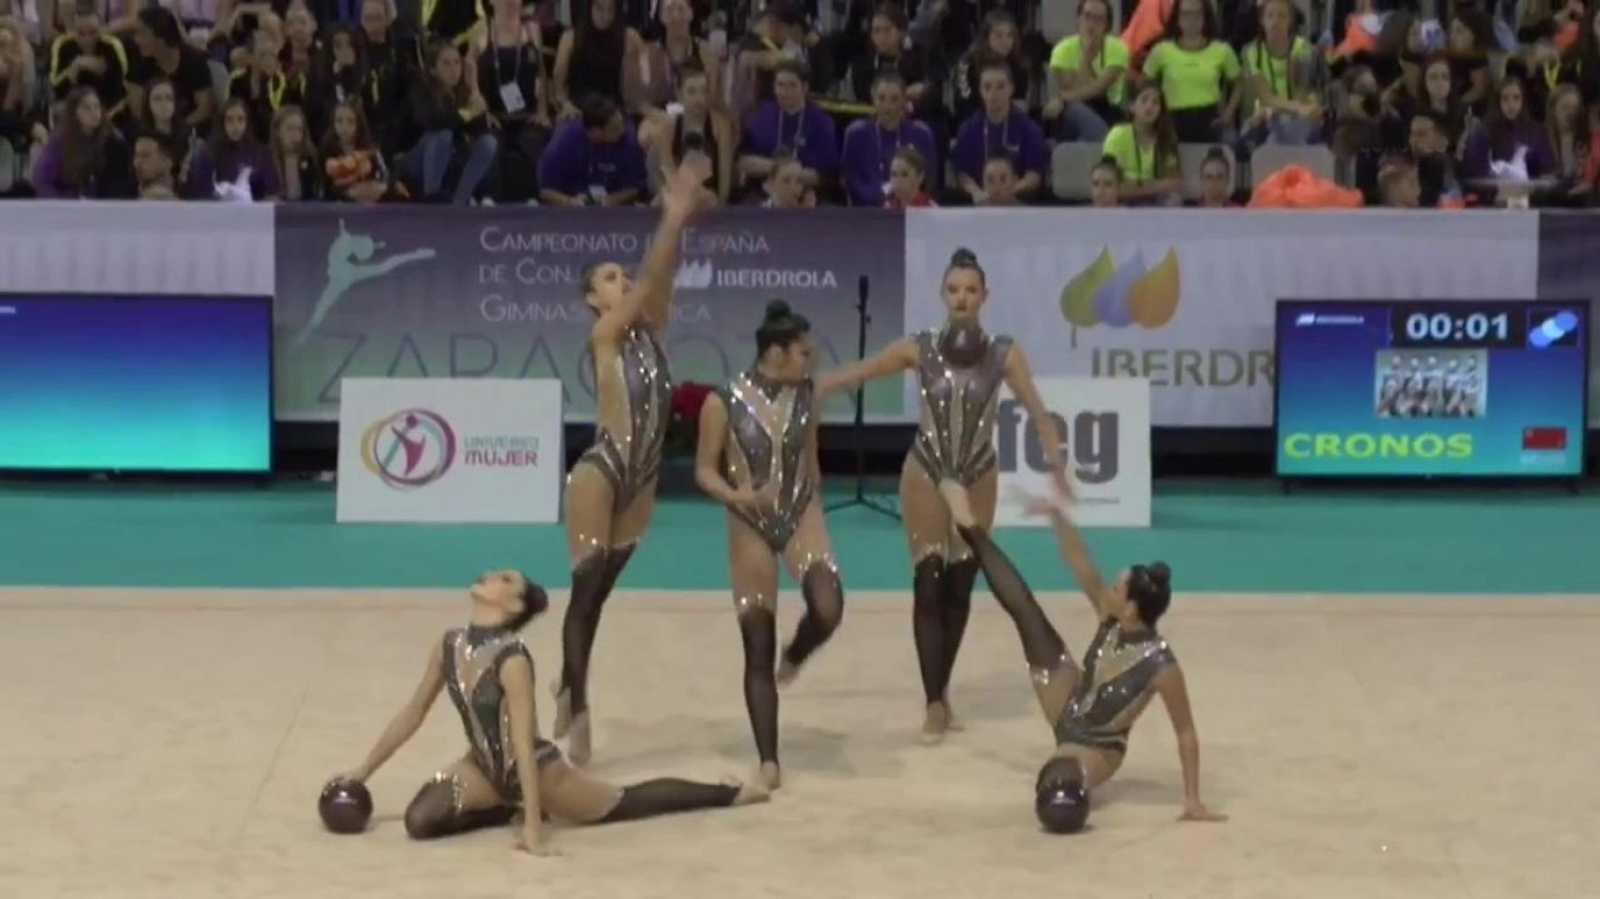 Gimnasia rítmica - Campeonato de España Conjuntos GR Iberdrola - ver ahora